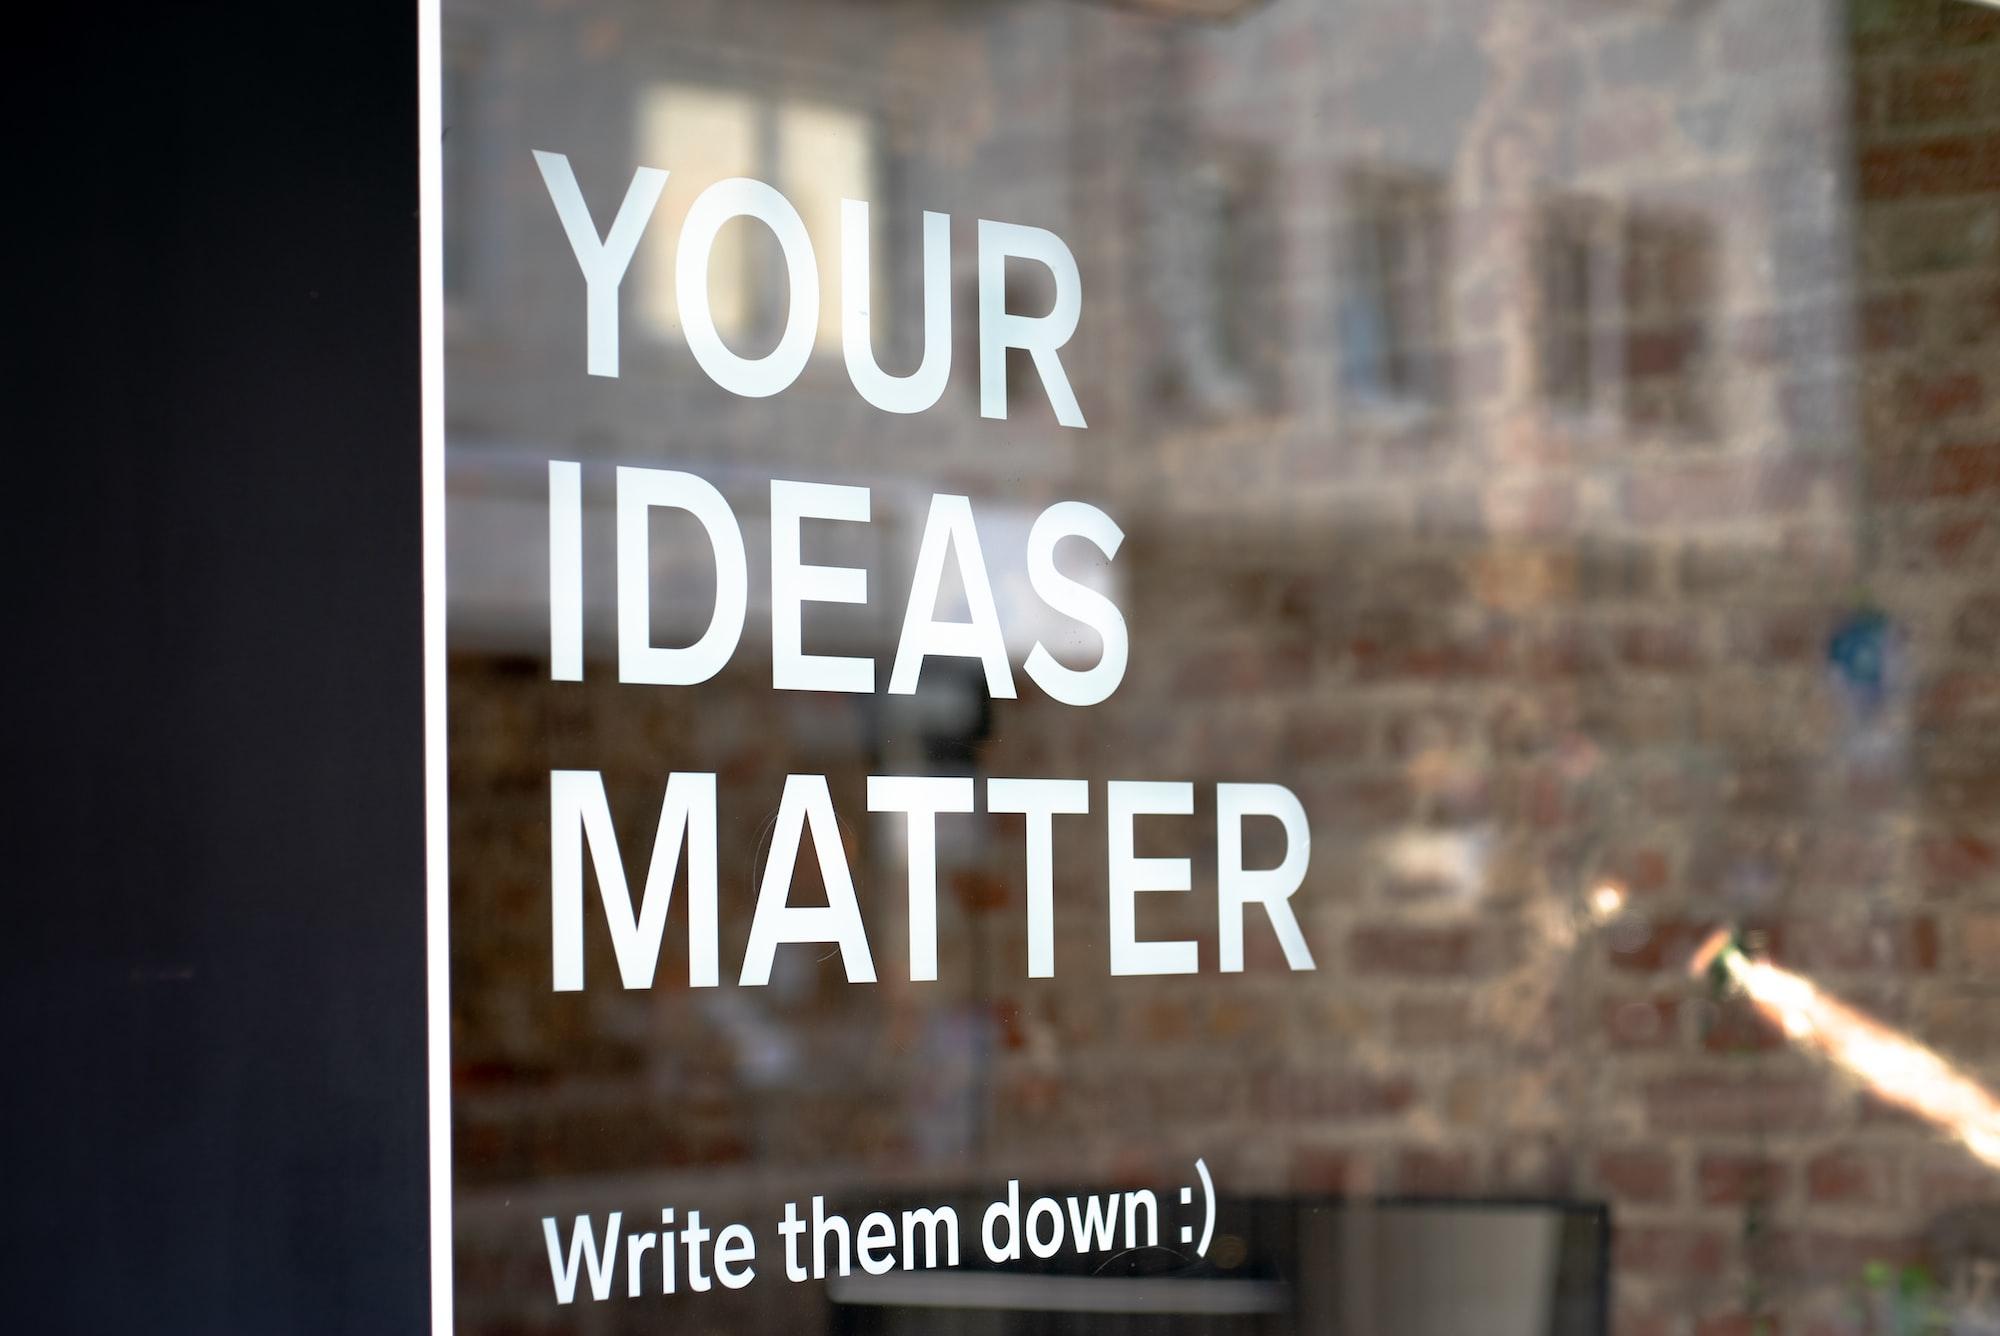 Your Ideas Matter! Test your ideas